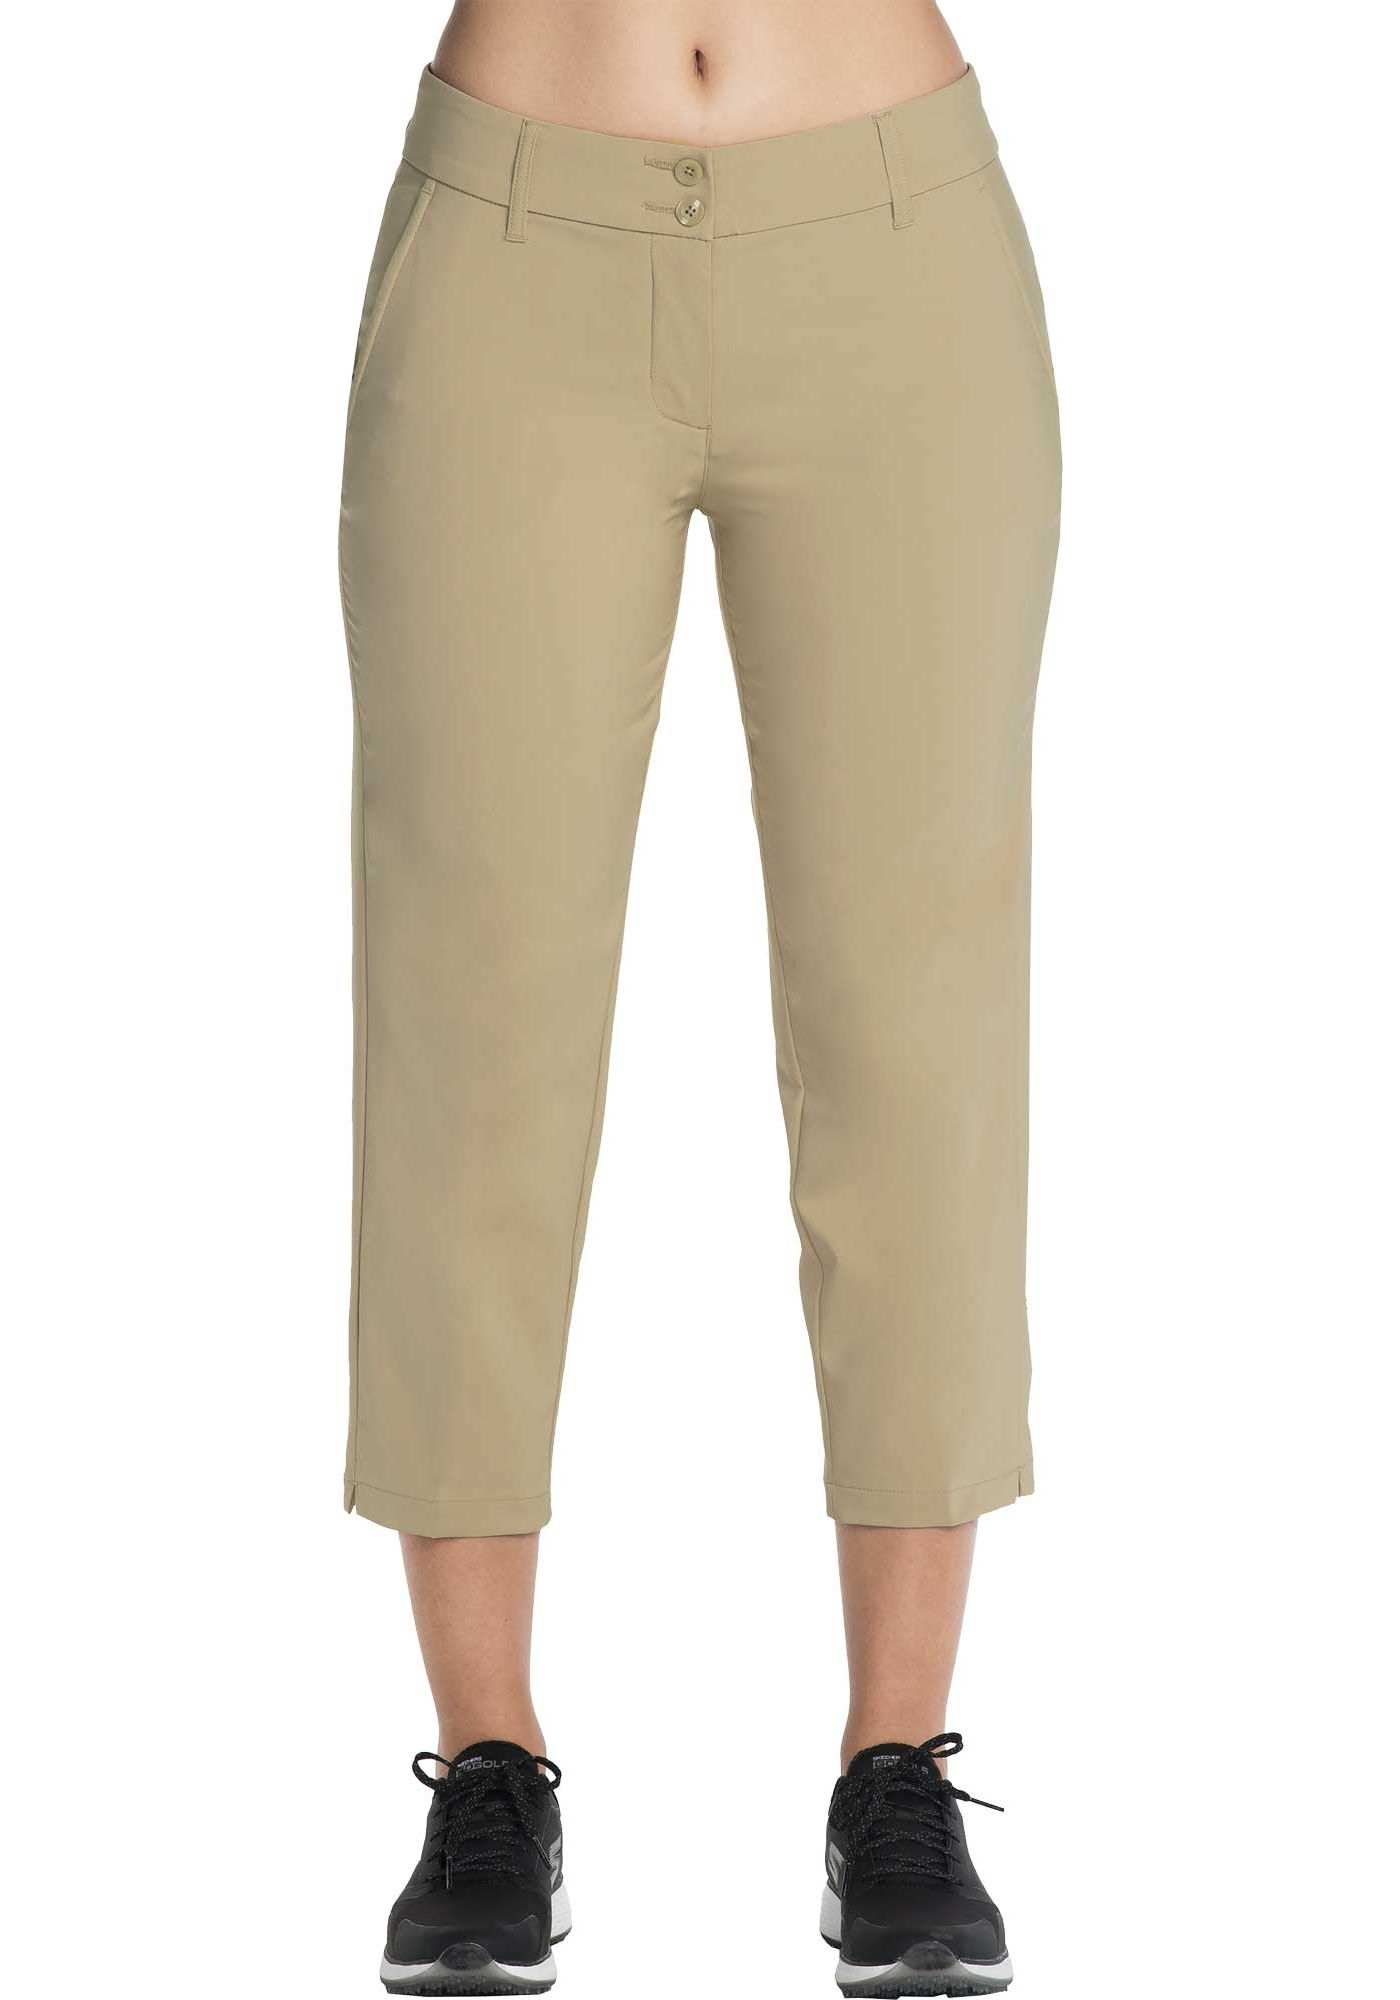 Skechers Women's Go Golf High Side Crop Golf Pants